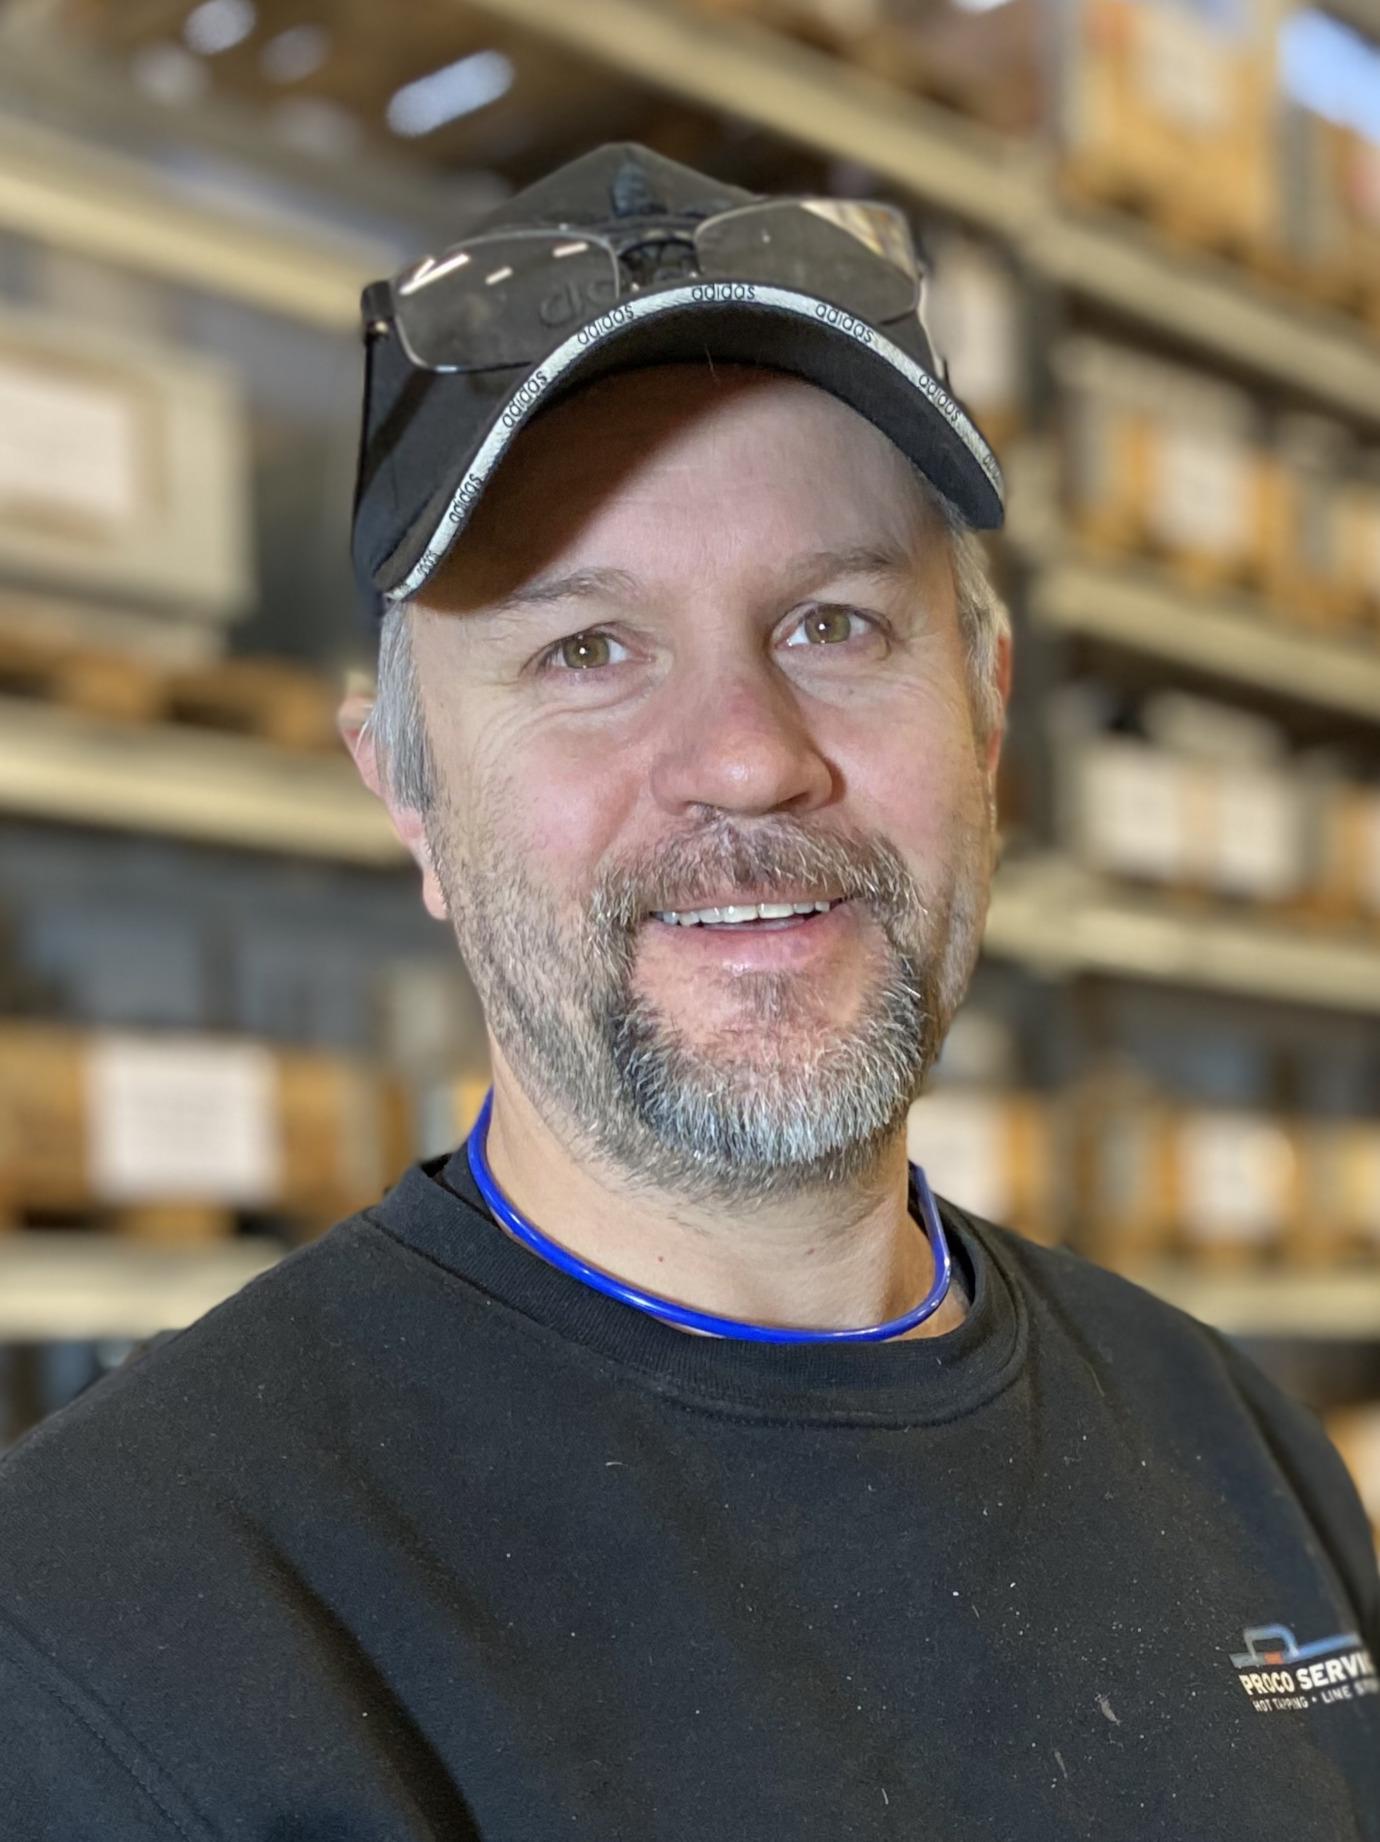 Mikael Sahlgren